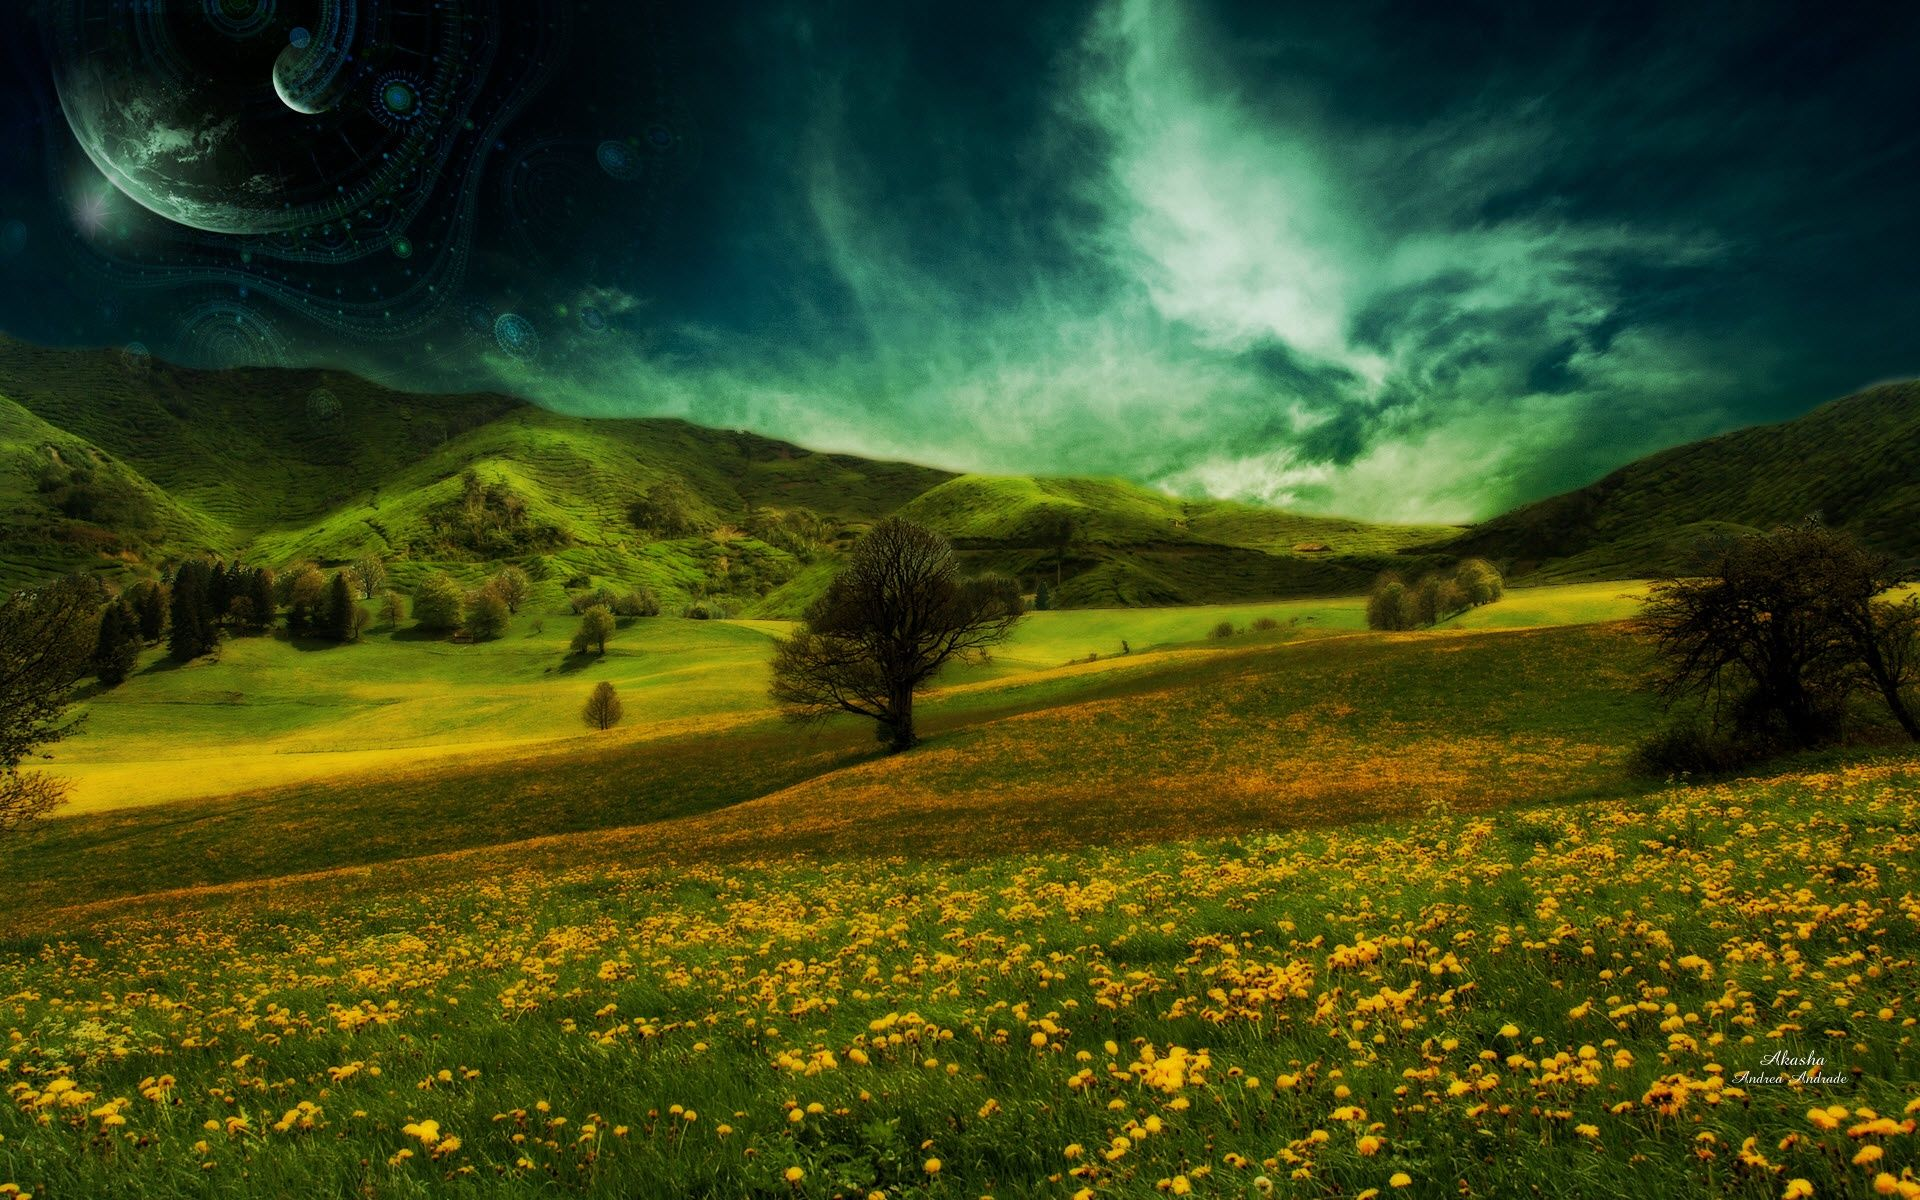 andrade art akasha by Andrea Andrade – Nature Fields HD Desktop Wallpaper